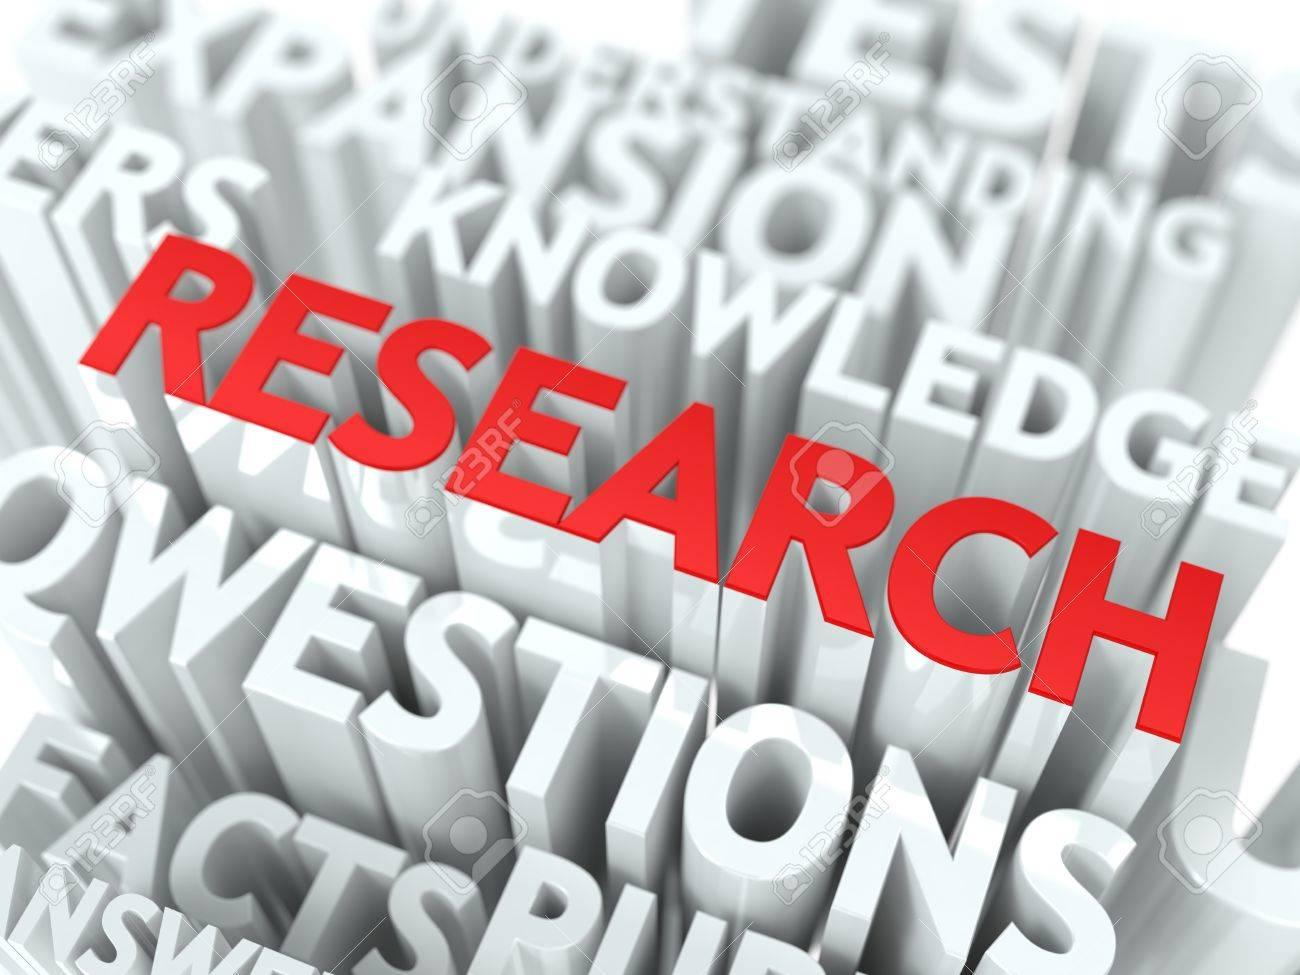 Research paper on cloud database pdf Scientific net